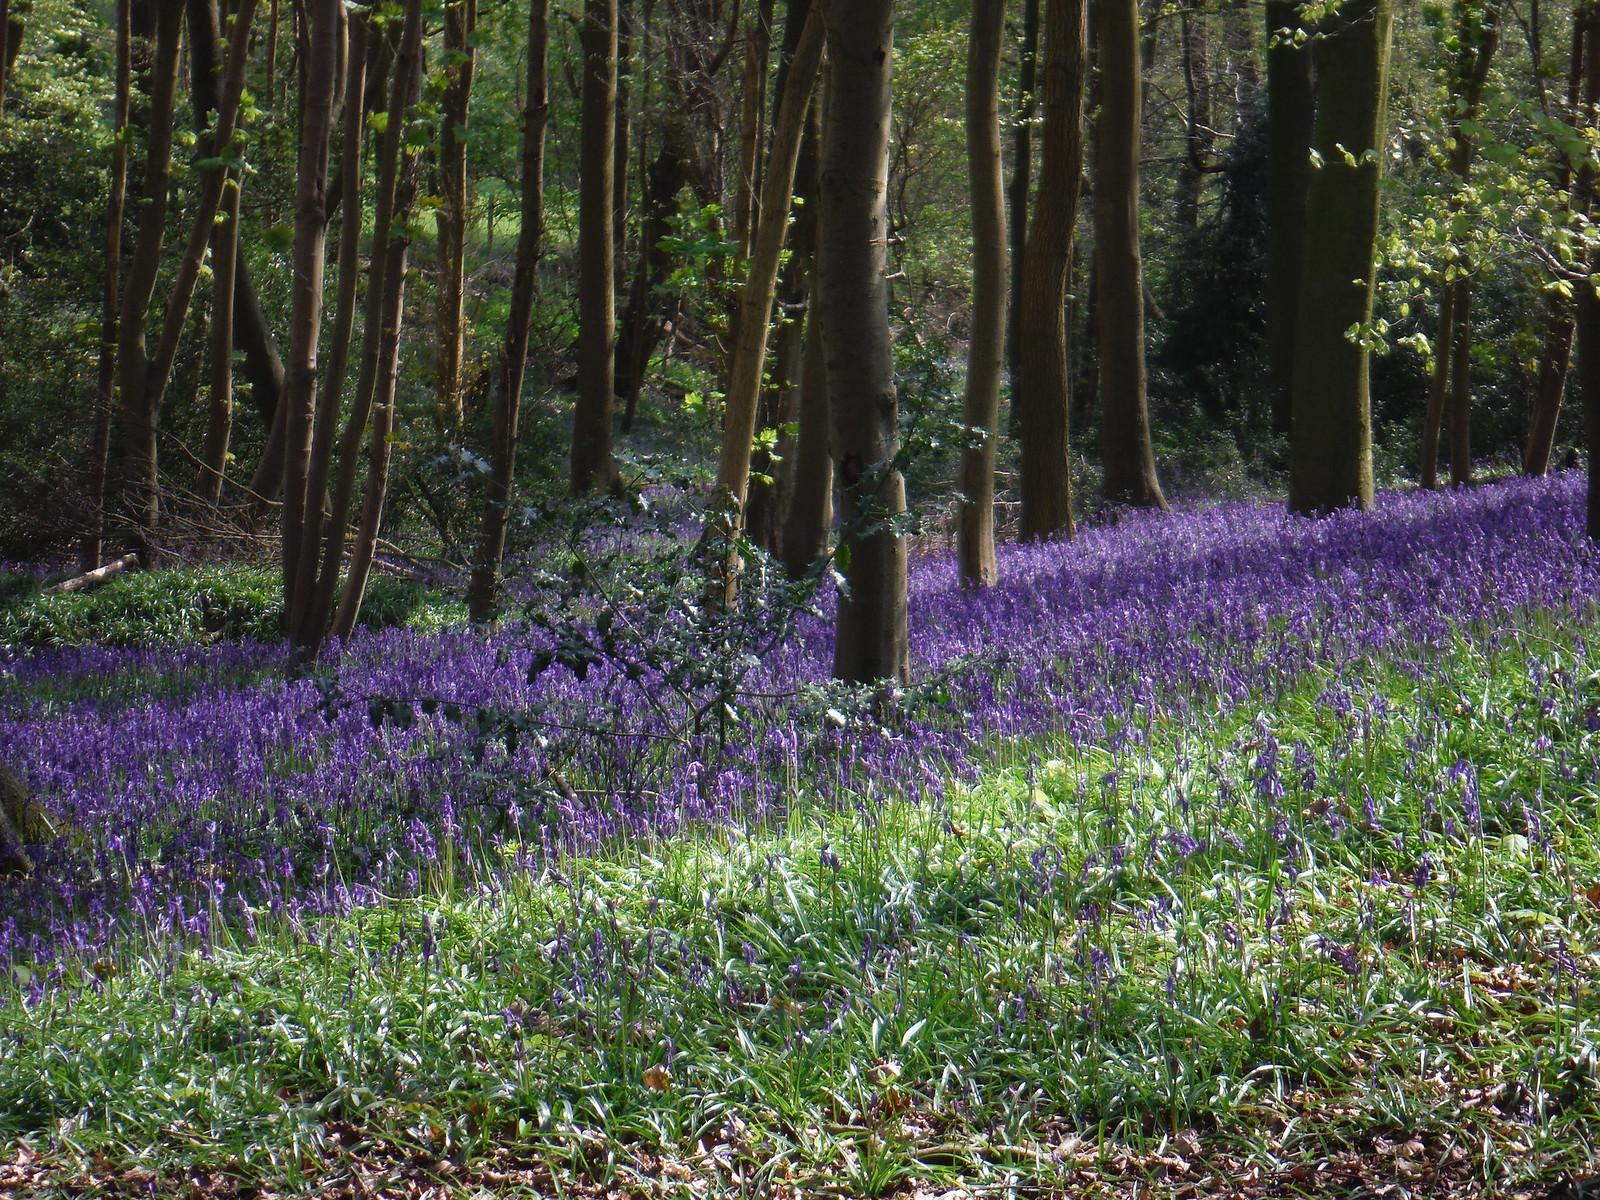 Bluebells in Bradenham Beeches SWC Walk 10 - Little Kimble to Saunderton